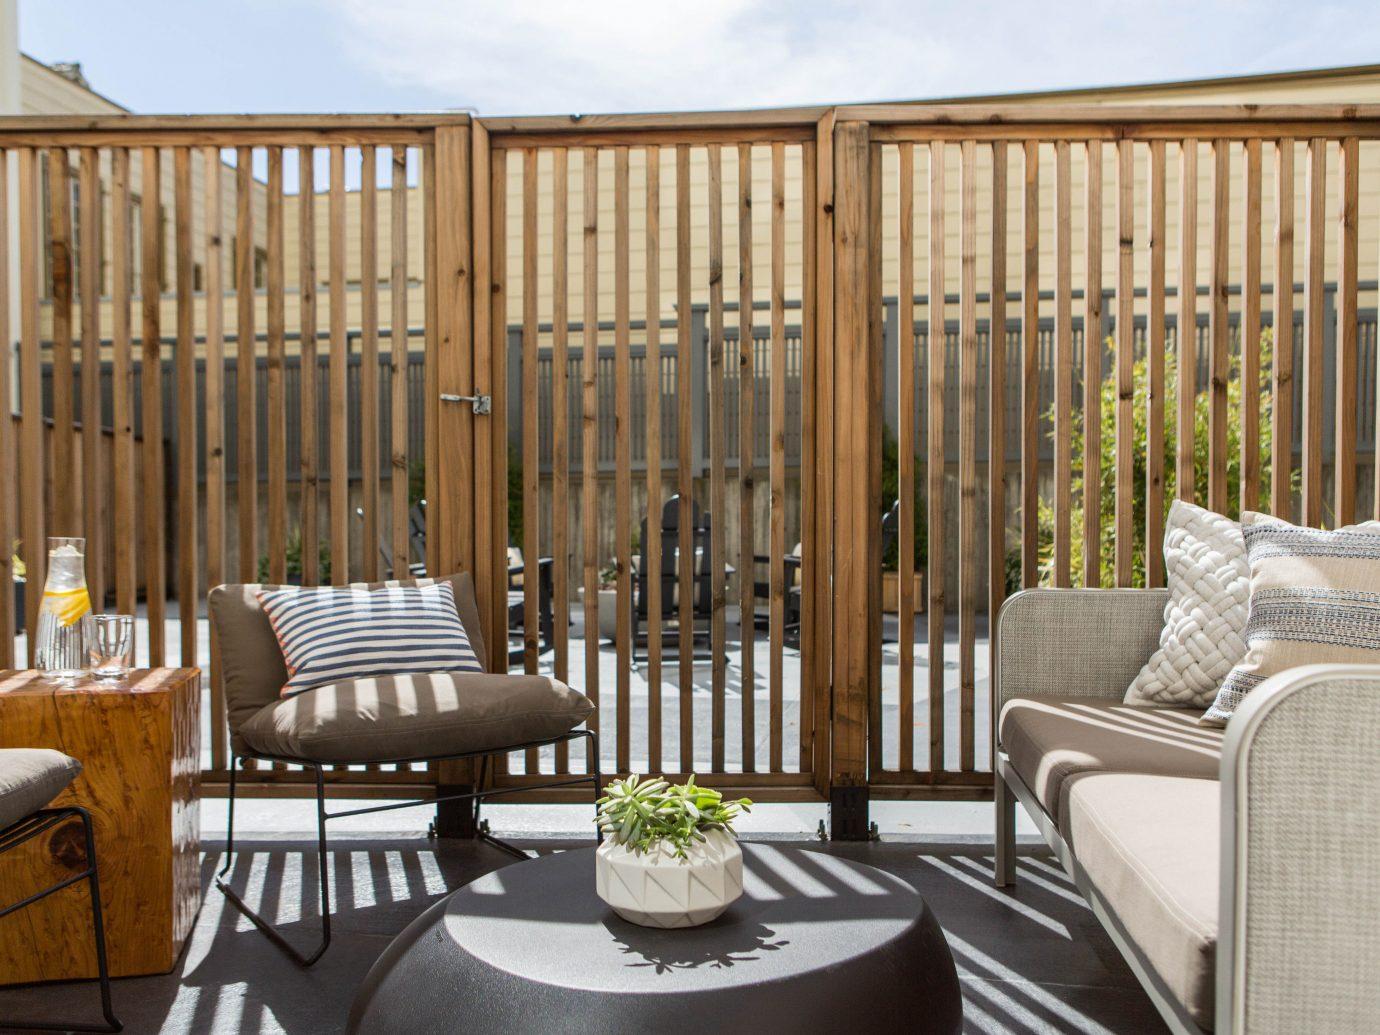 Hotels chair indoor floor room property Living porch outdoor structure wood home estate interior design real estate baluster furniture area